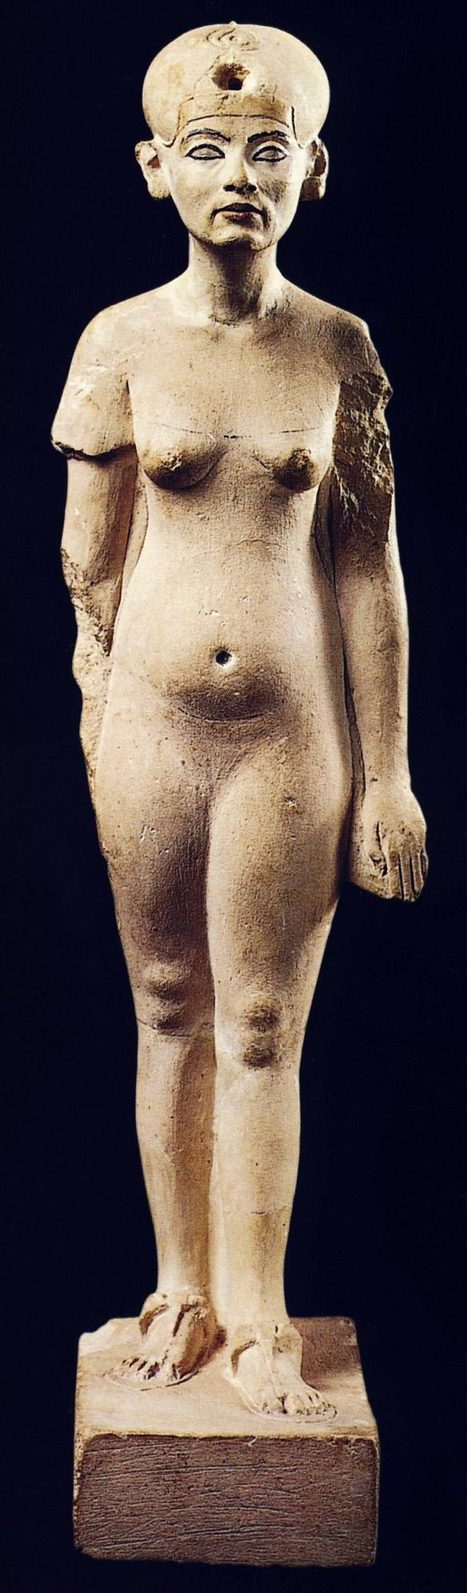 Nefertiti envejecida   Dos reinas poderosas de Egipto -Cleopatra vs. Nefertiti-   Scoop.it